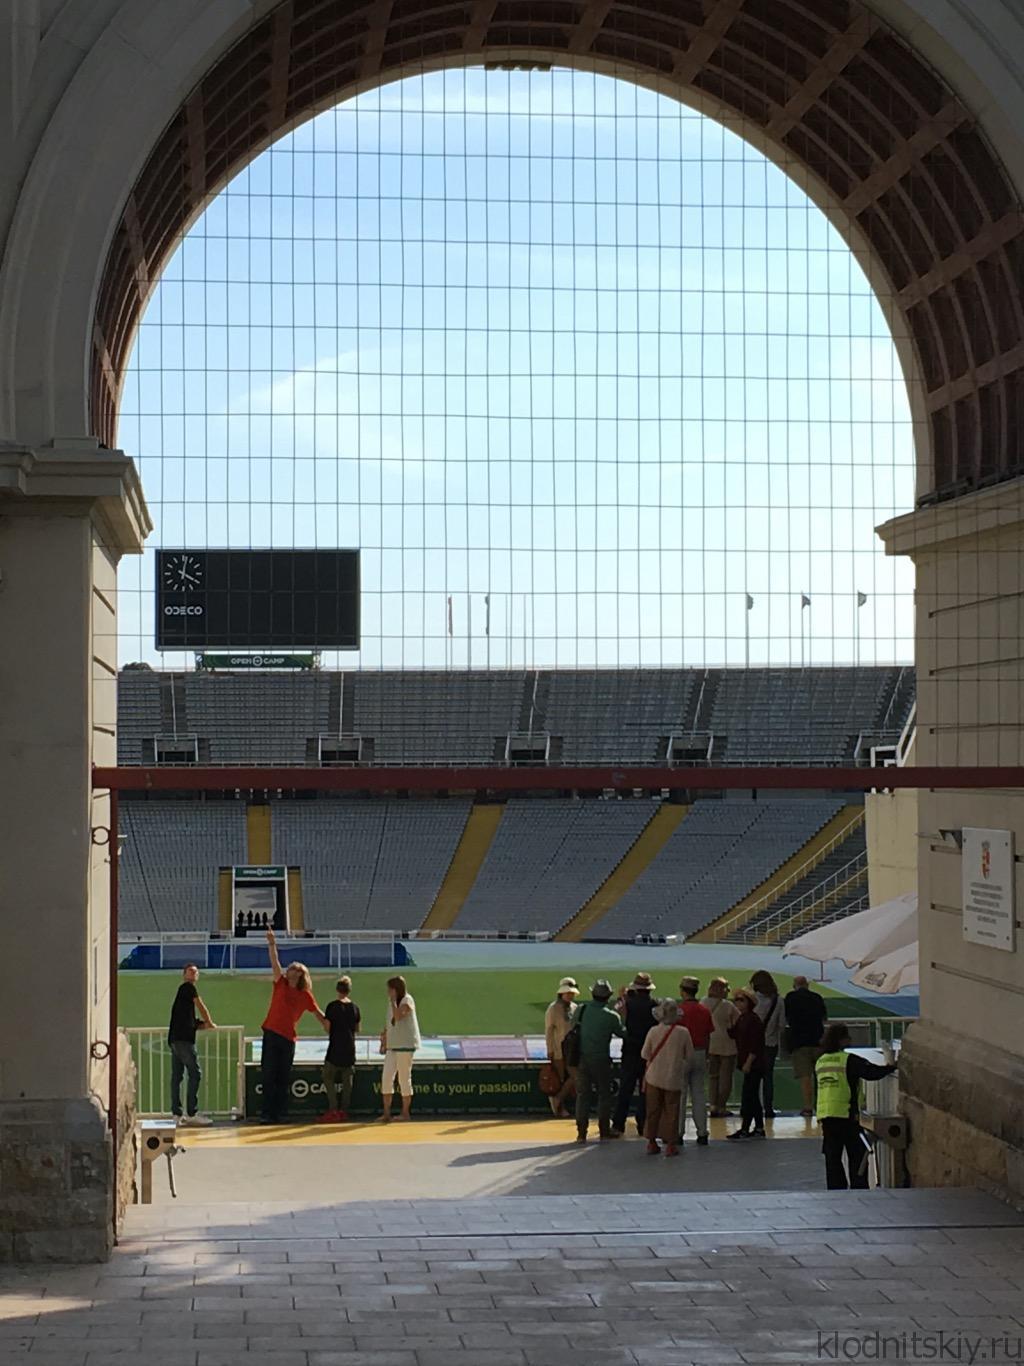 Барселона (Олимпийский стадион)